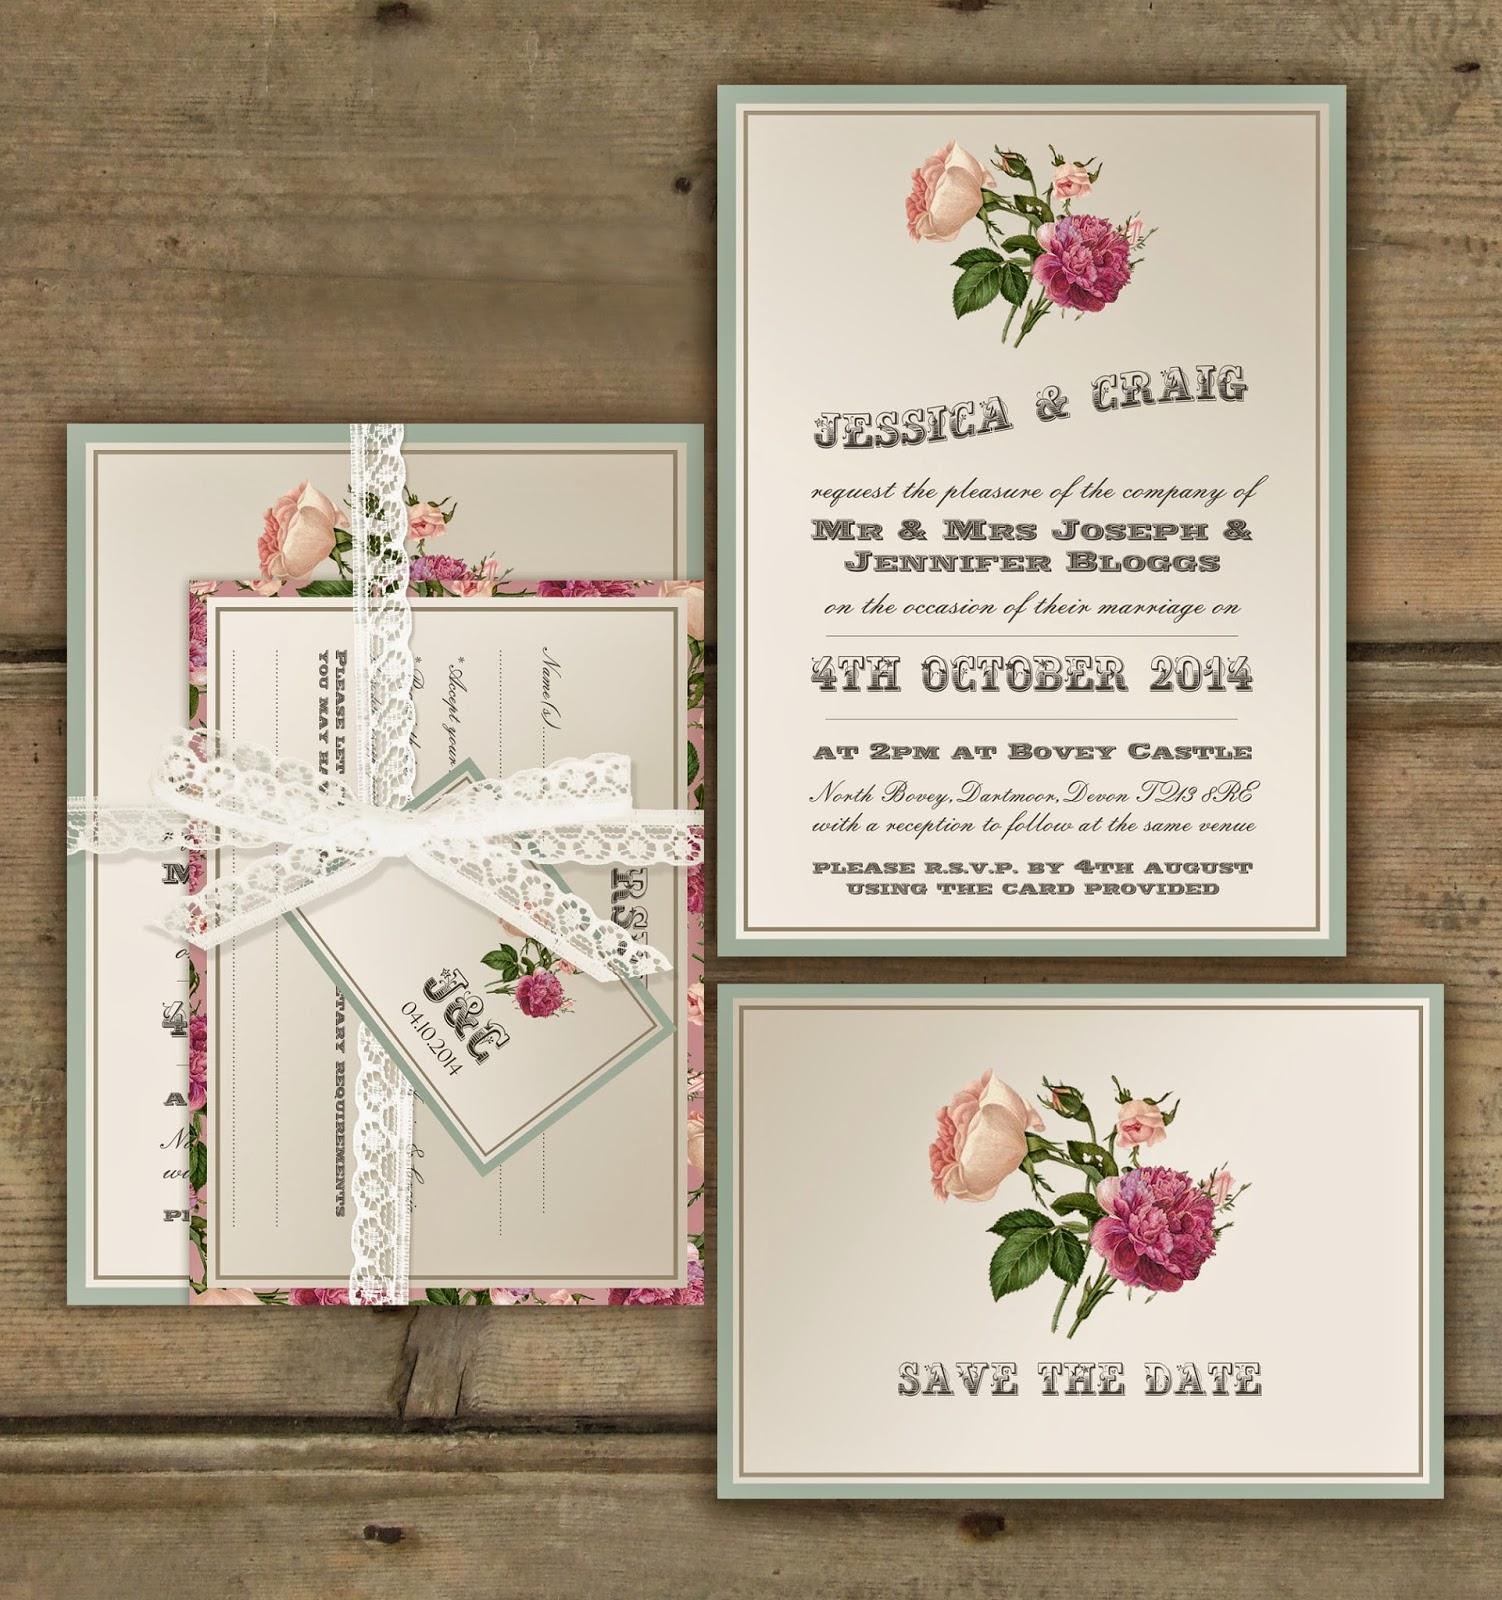 Knots and kisses wedding stationery victorian garden for Garden wedding invitation designs